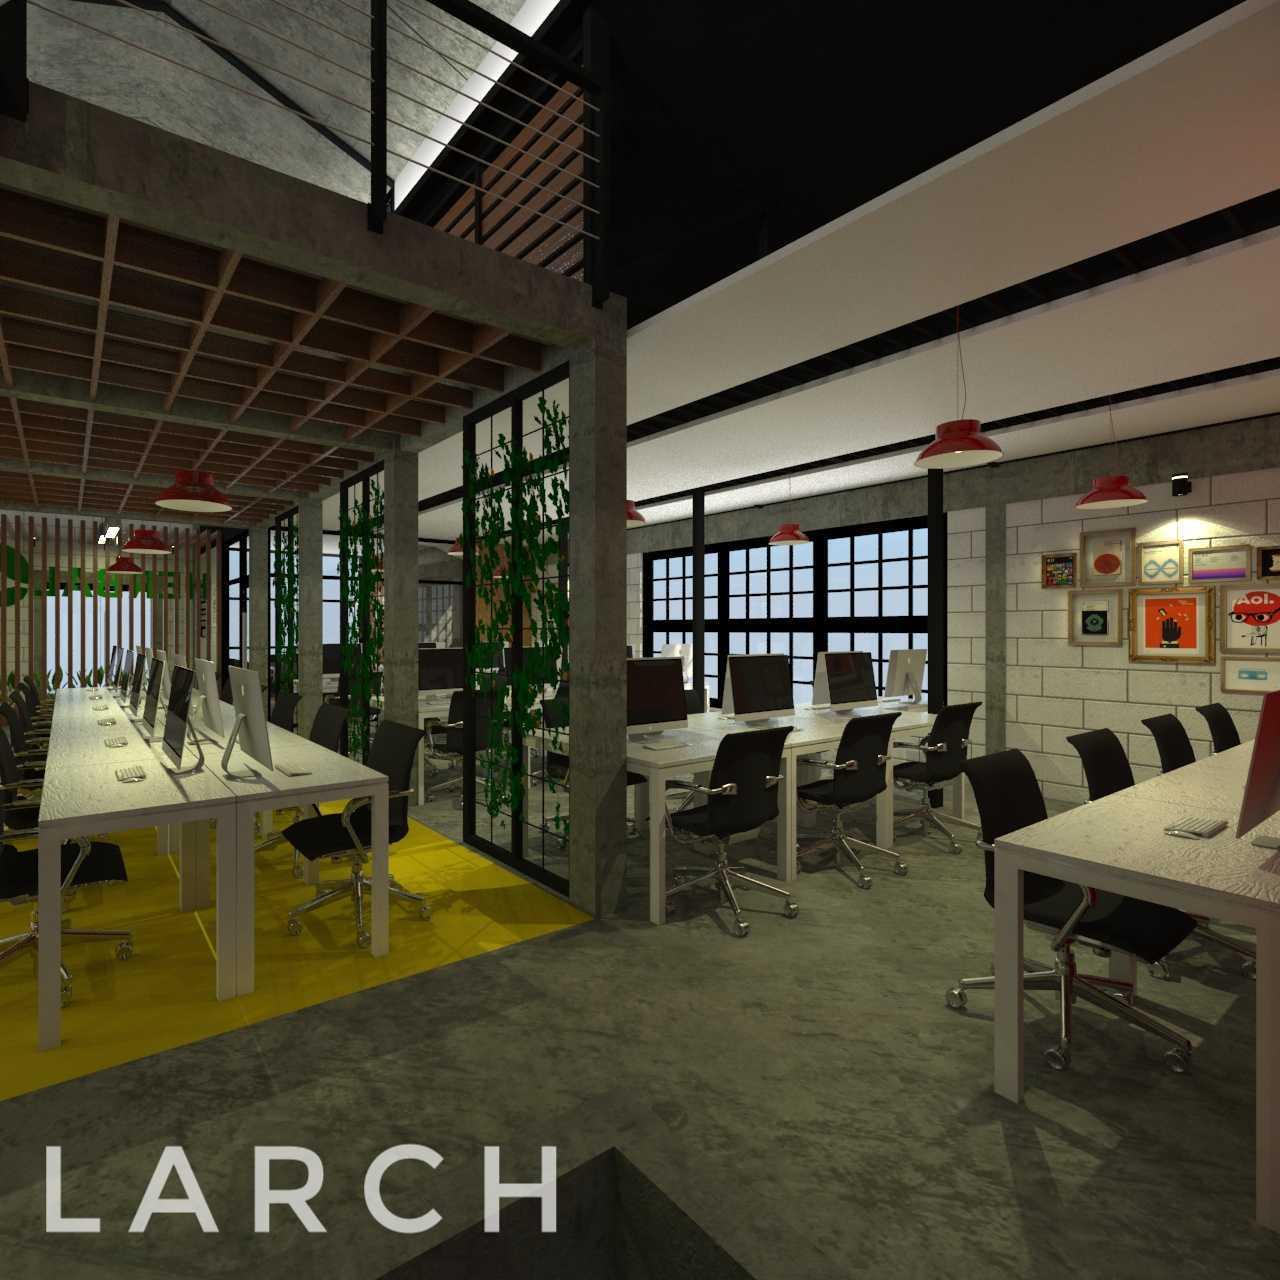 Larch Architecture Team Kantor Herbaltv Tasikmalaya, Jawa Barat, Indonesia Tasikmalaya, Jawa Barat, Indonesia Larch-Architecture-Team-Kantor-Herbaltv  67050